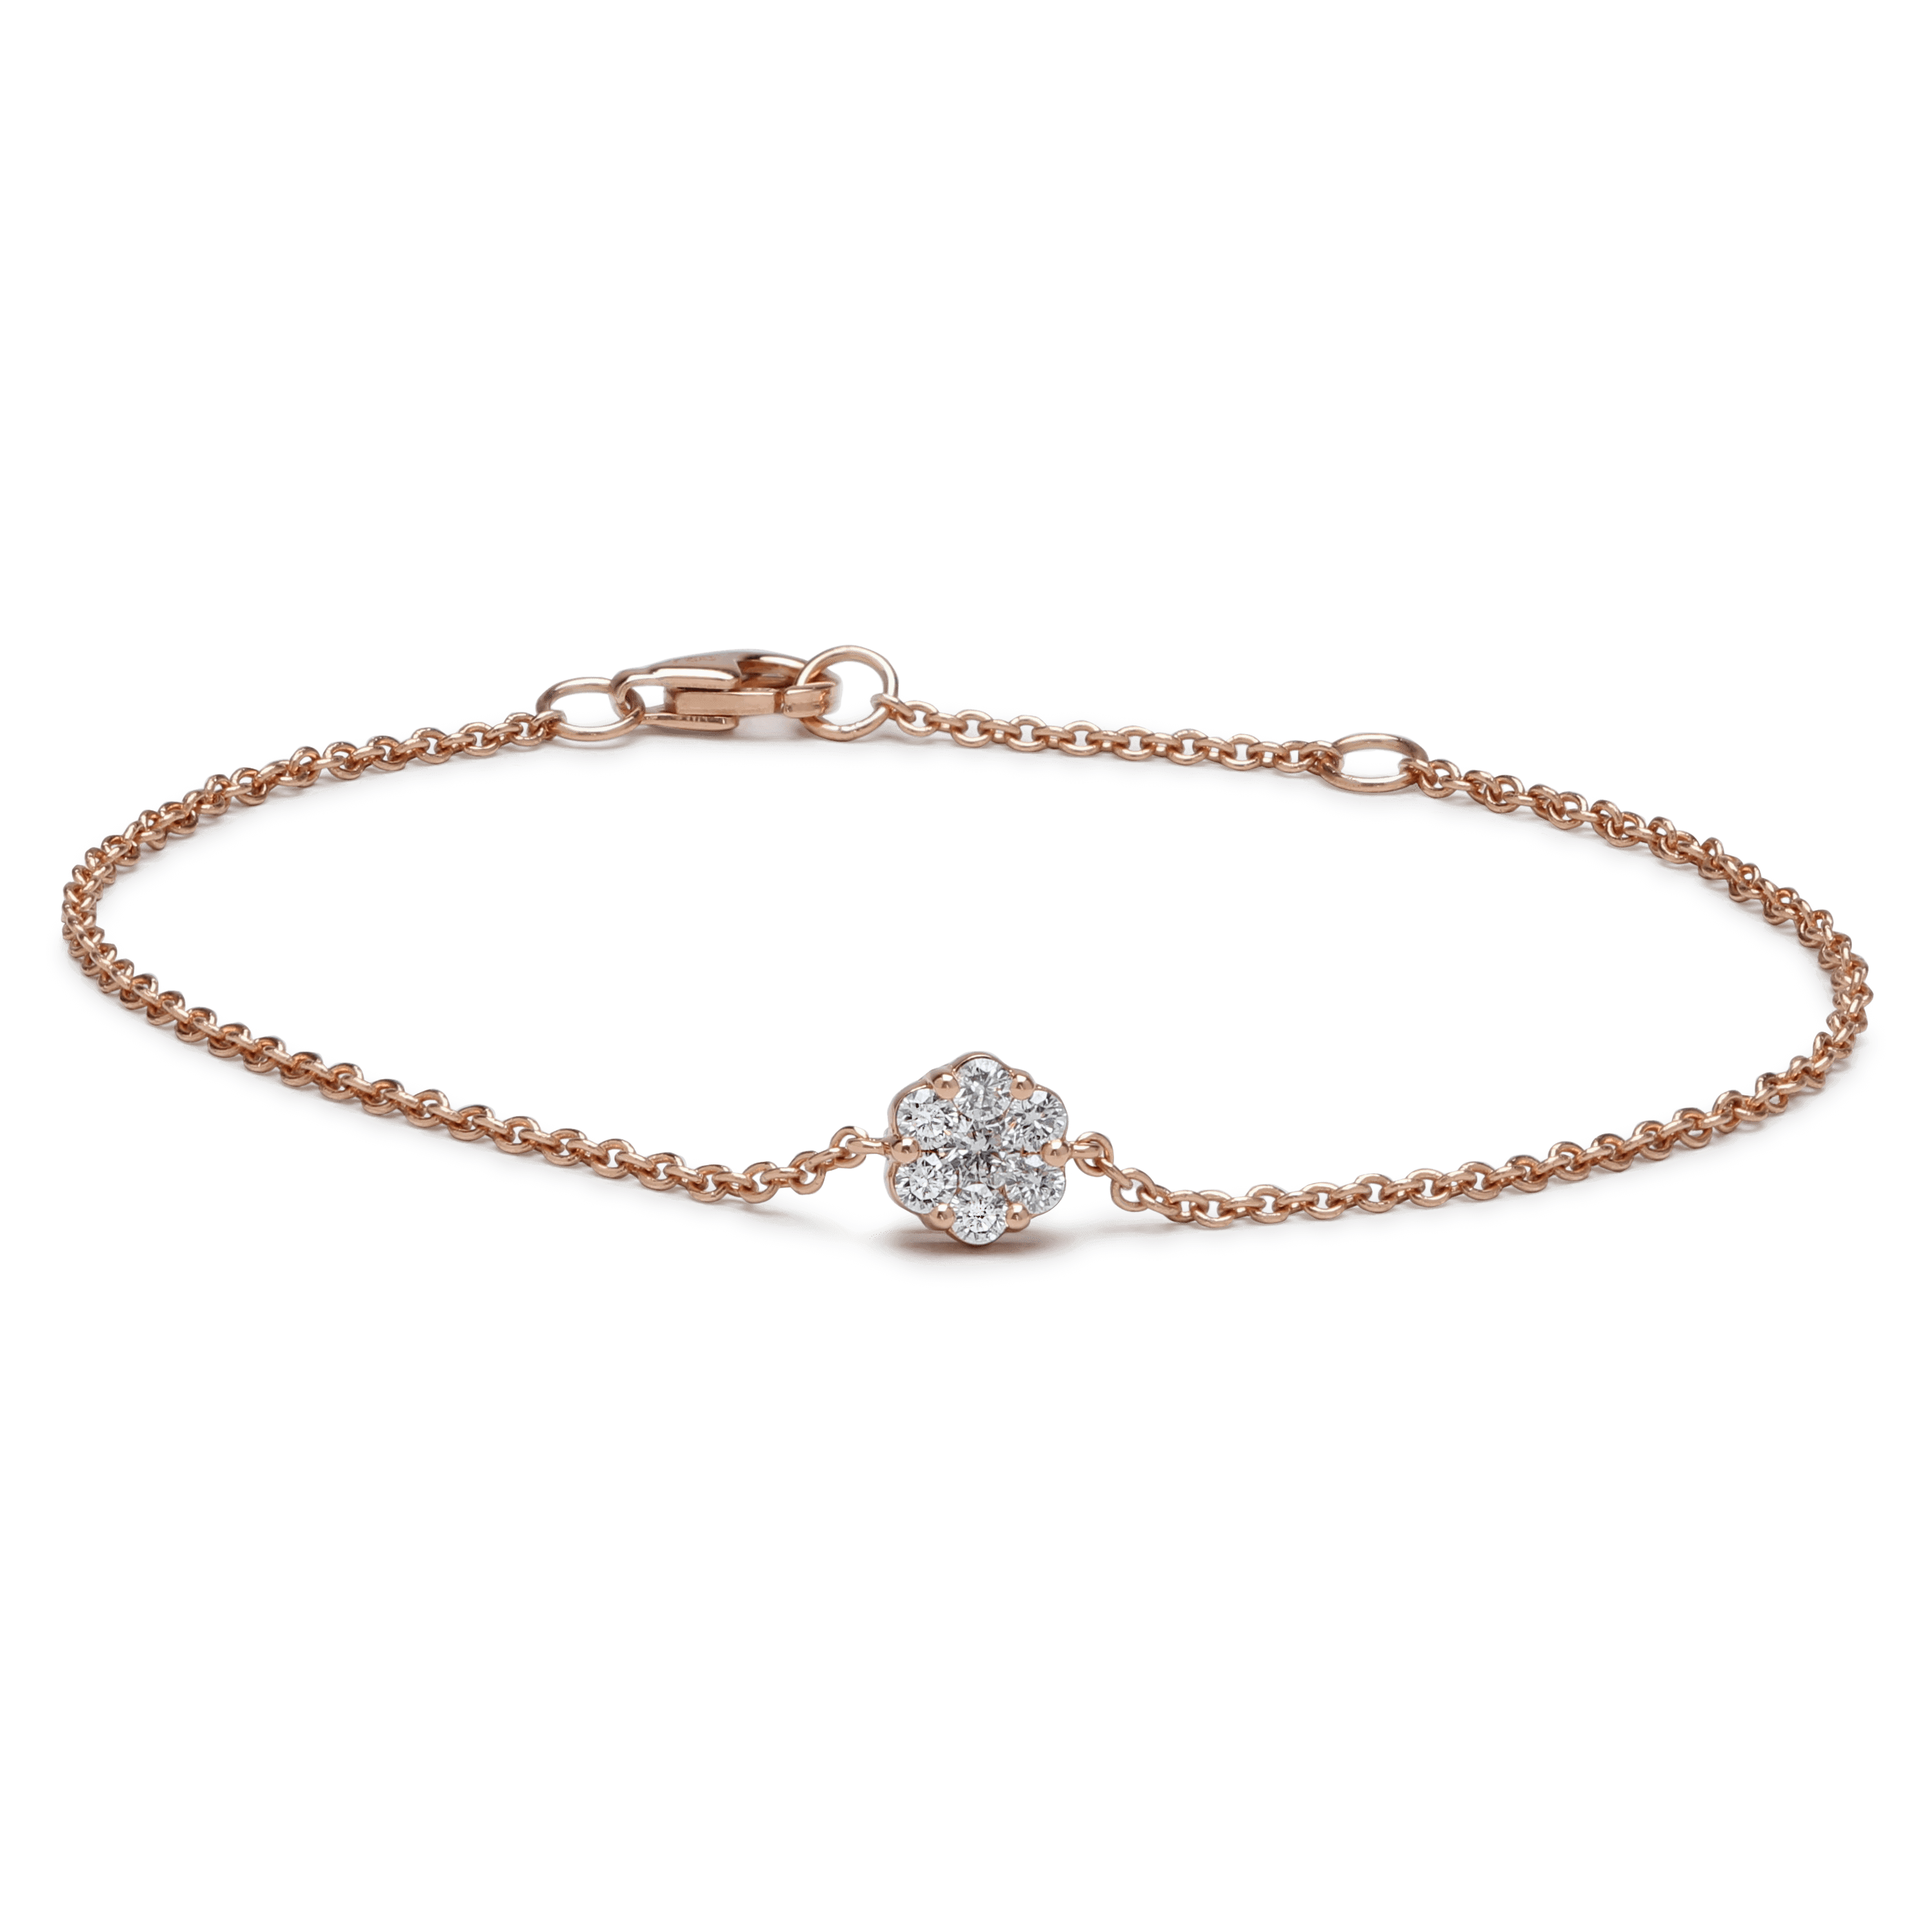 25691 - Rose Gold Diamond Bracelet